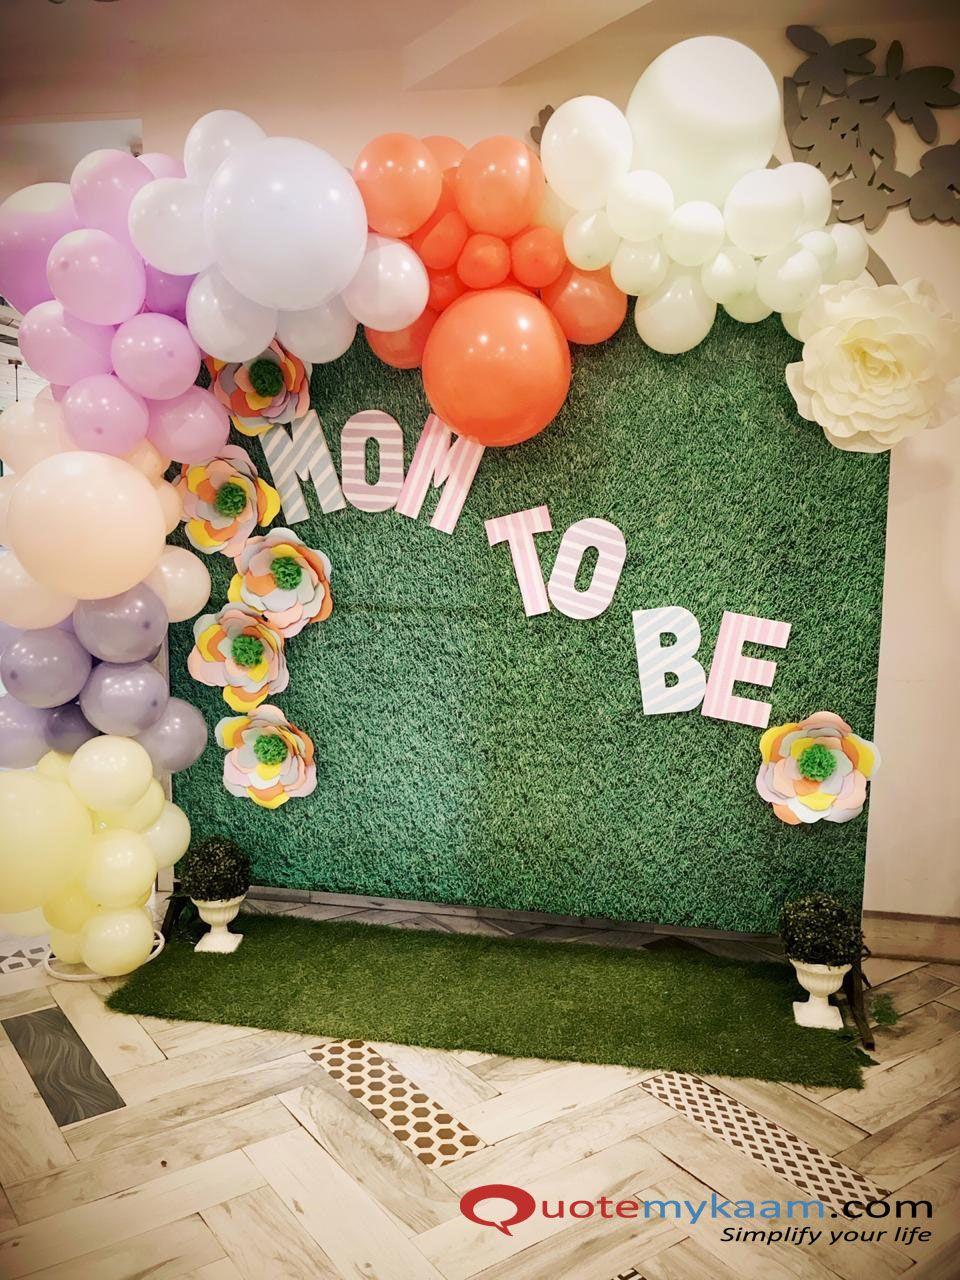 Best Balloon Decoration Balloon decorations, Baby shower